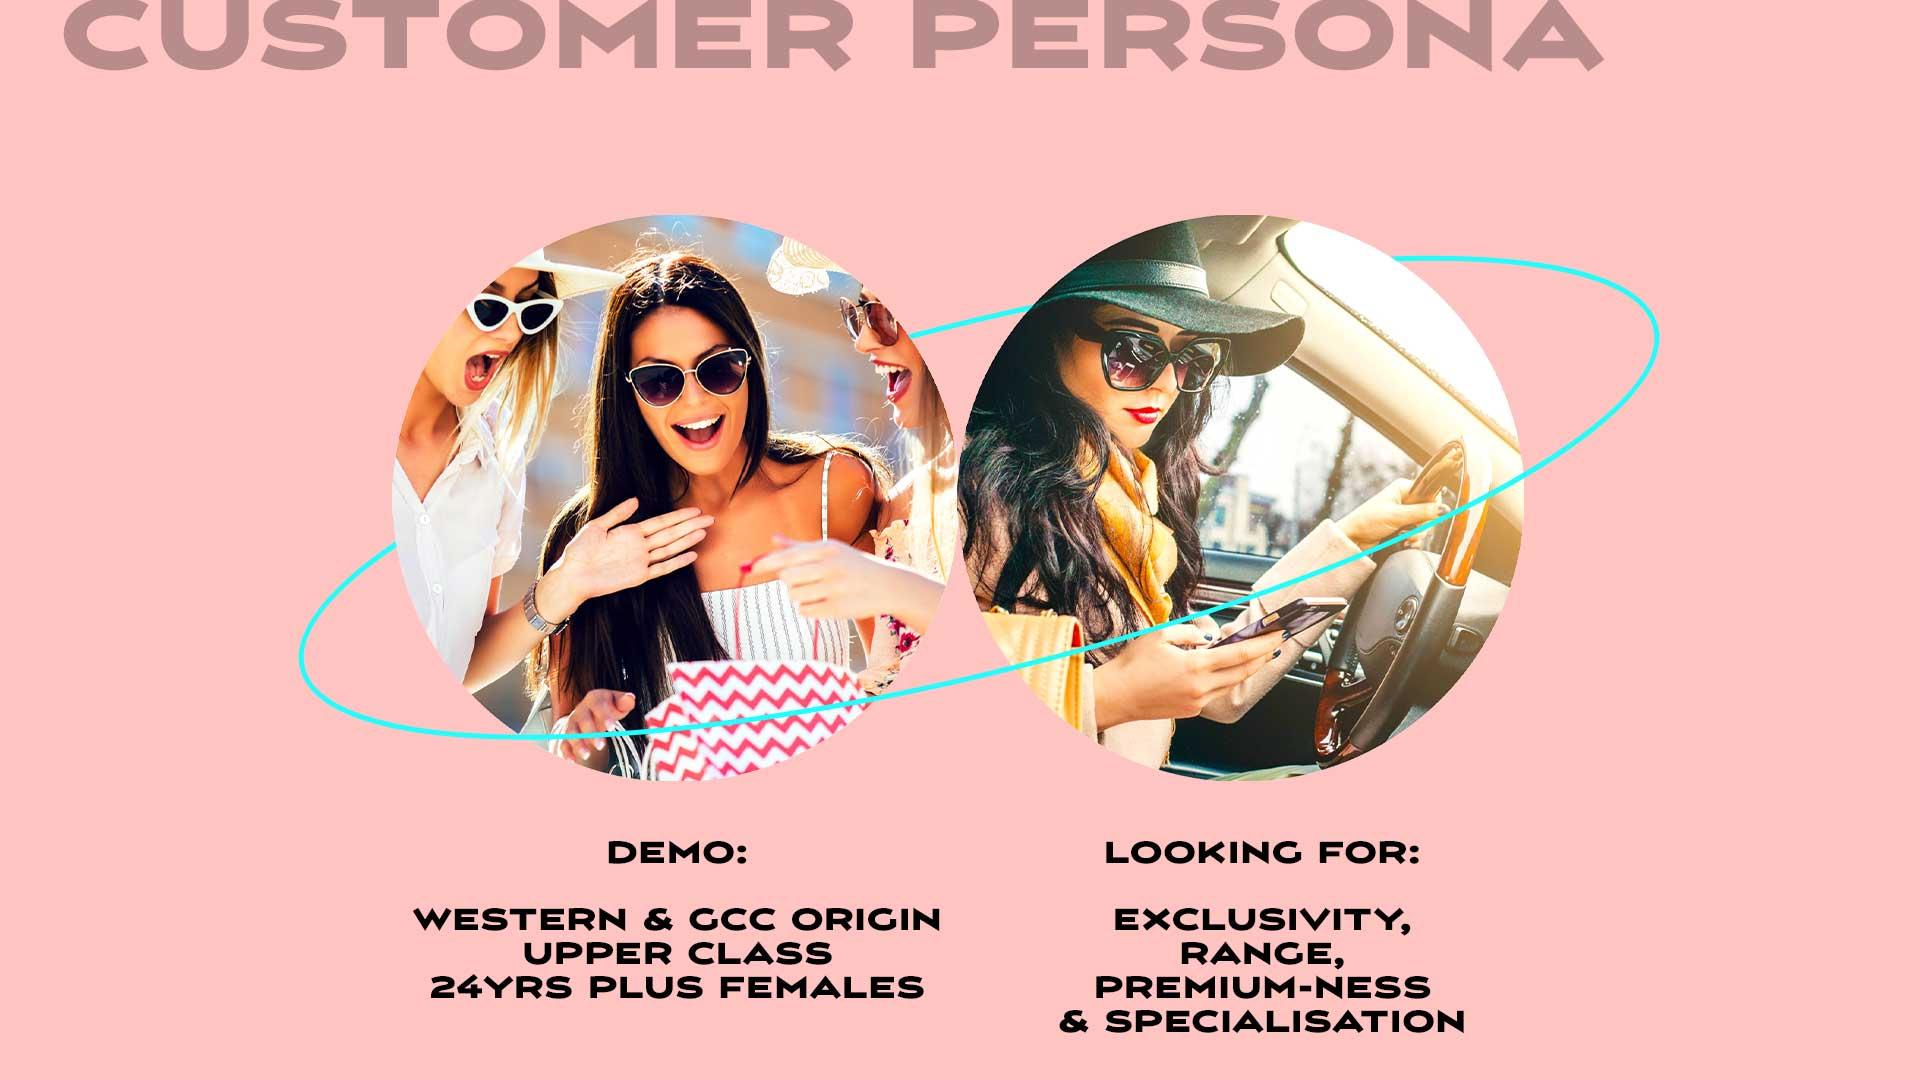 The Fashion Net Customer Persona